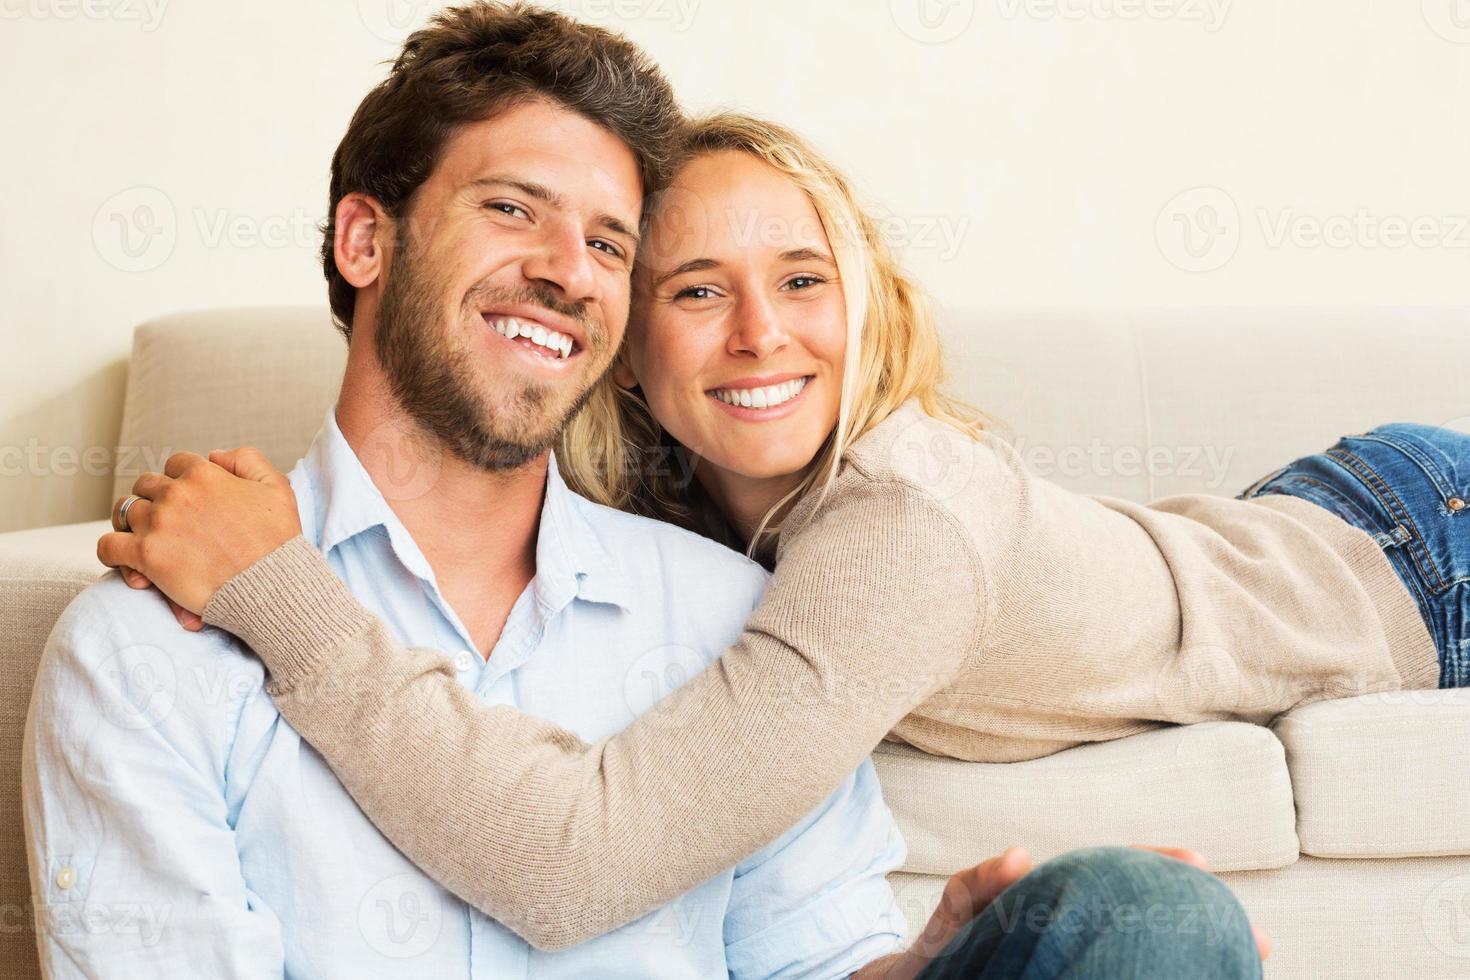 jovem casal feliz em casa no sofá foto